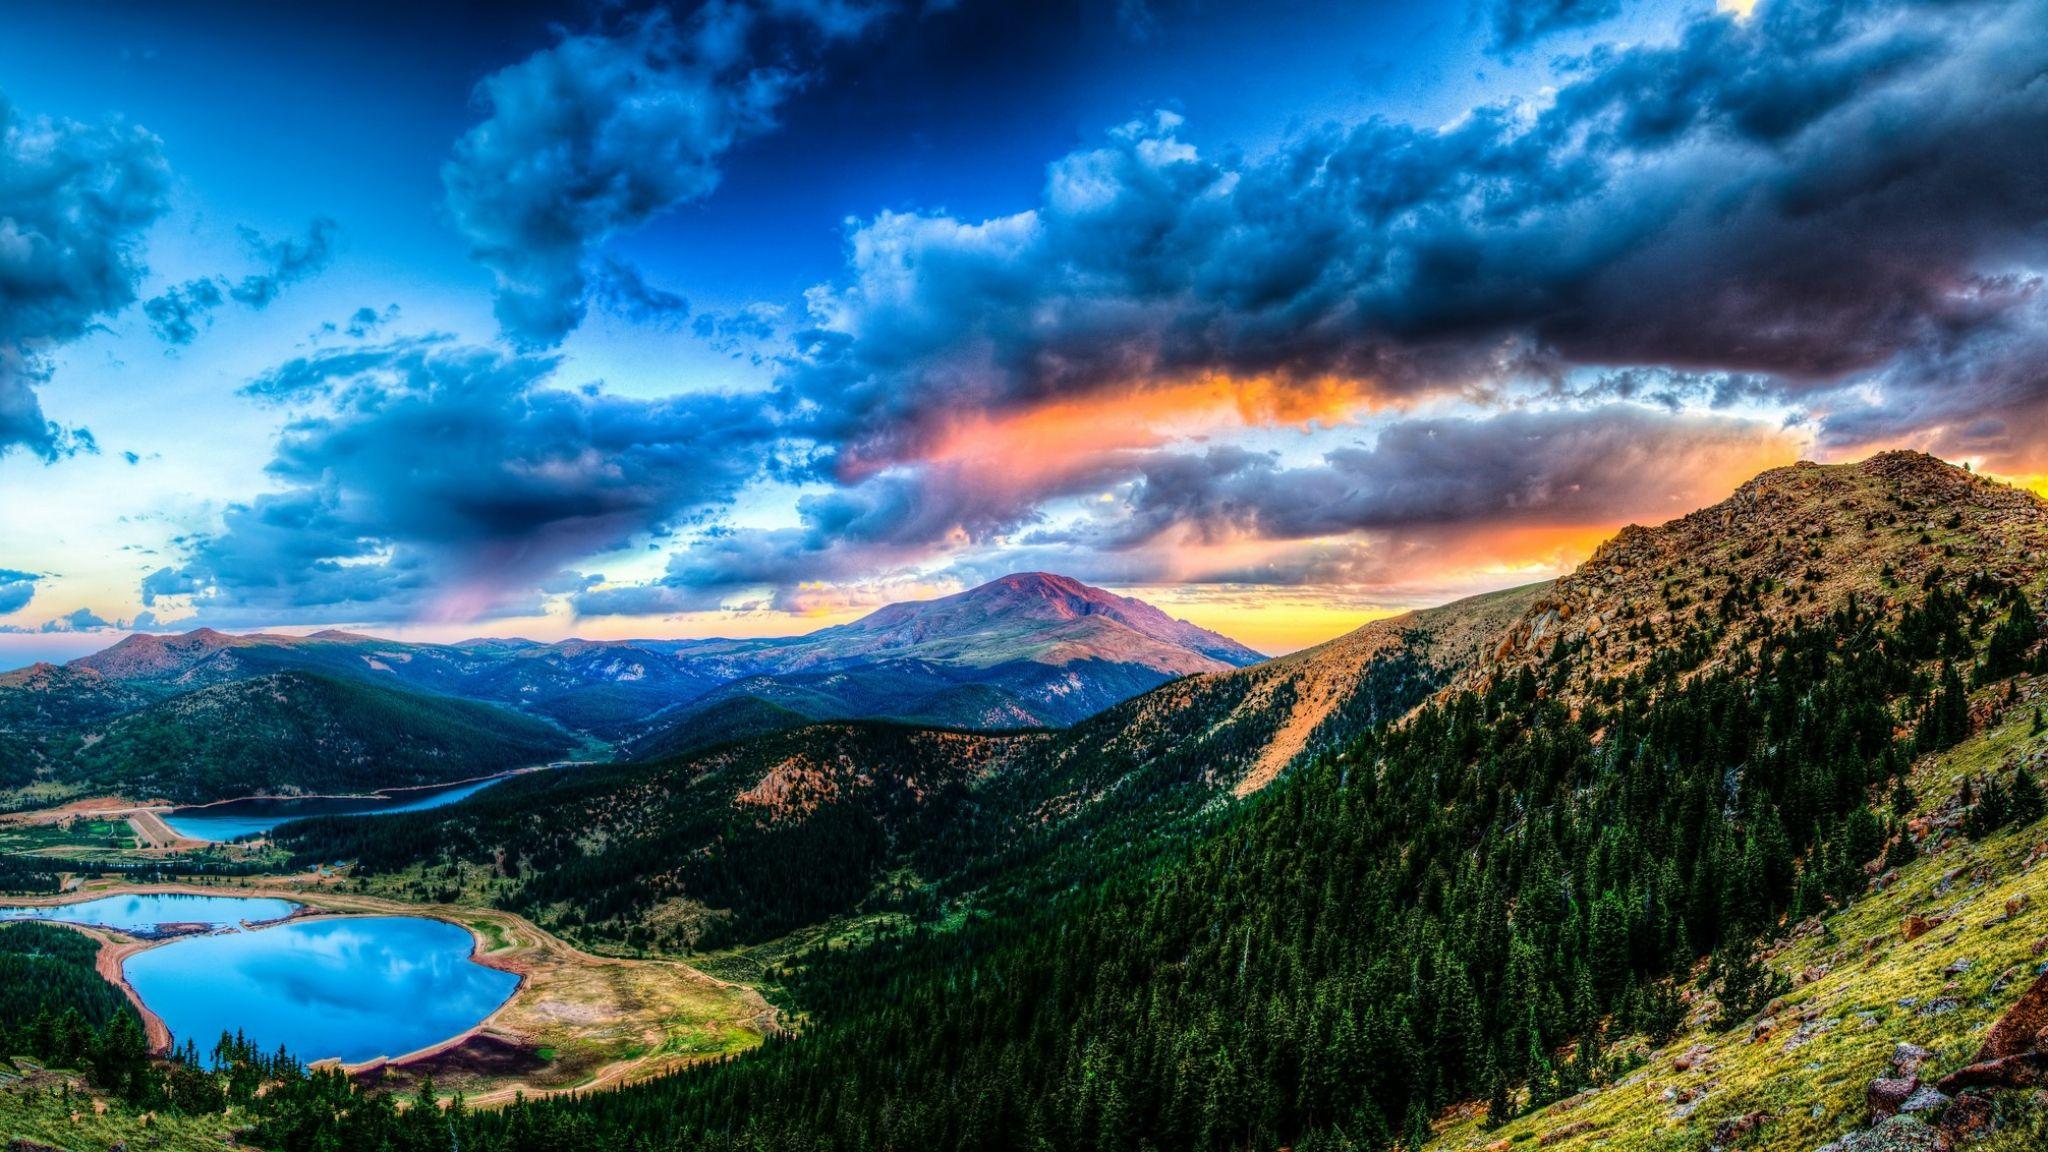 Download Wallpaper 2048x1152 Sunset Mountain Lake Landscape Hd